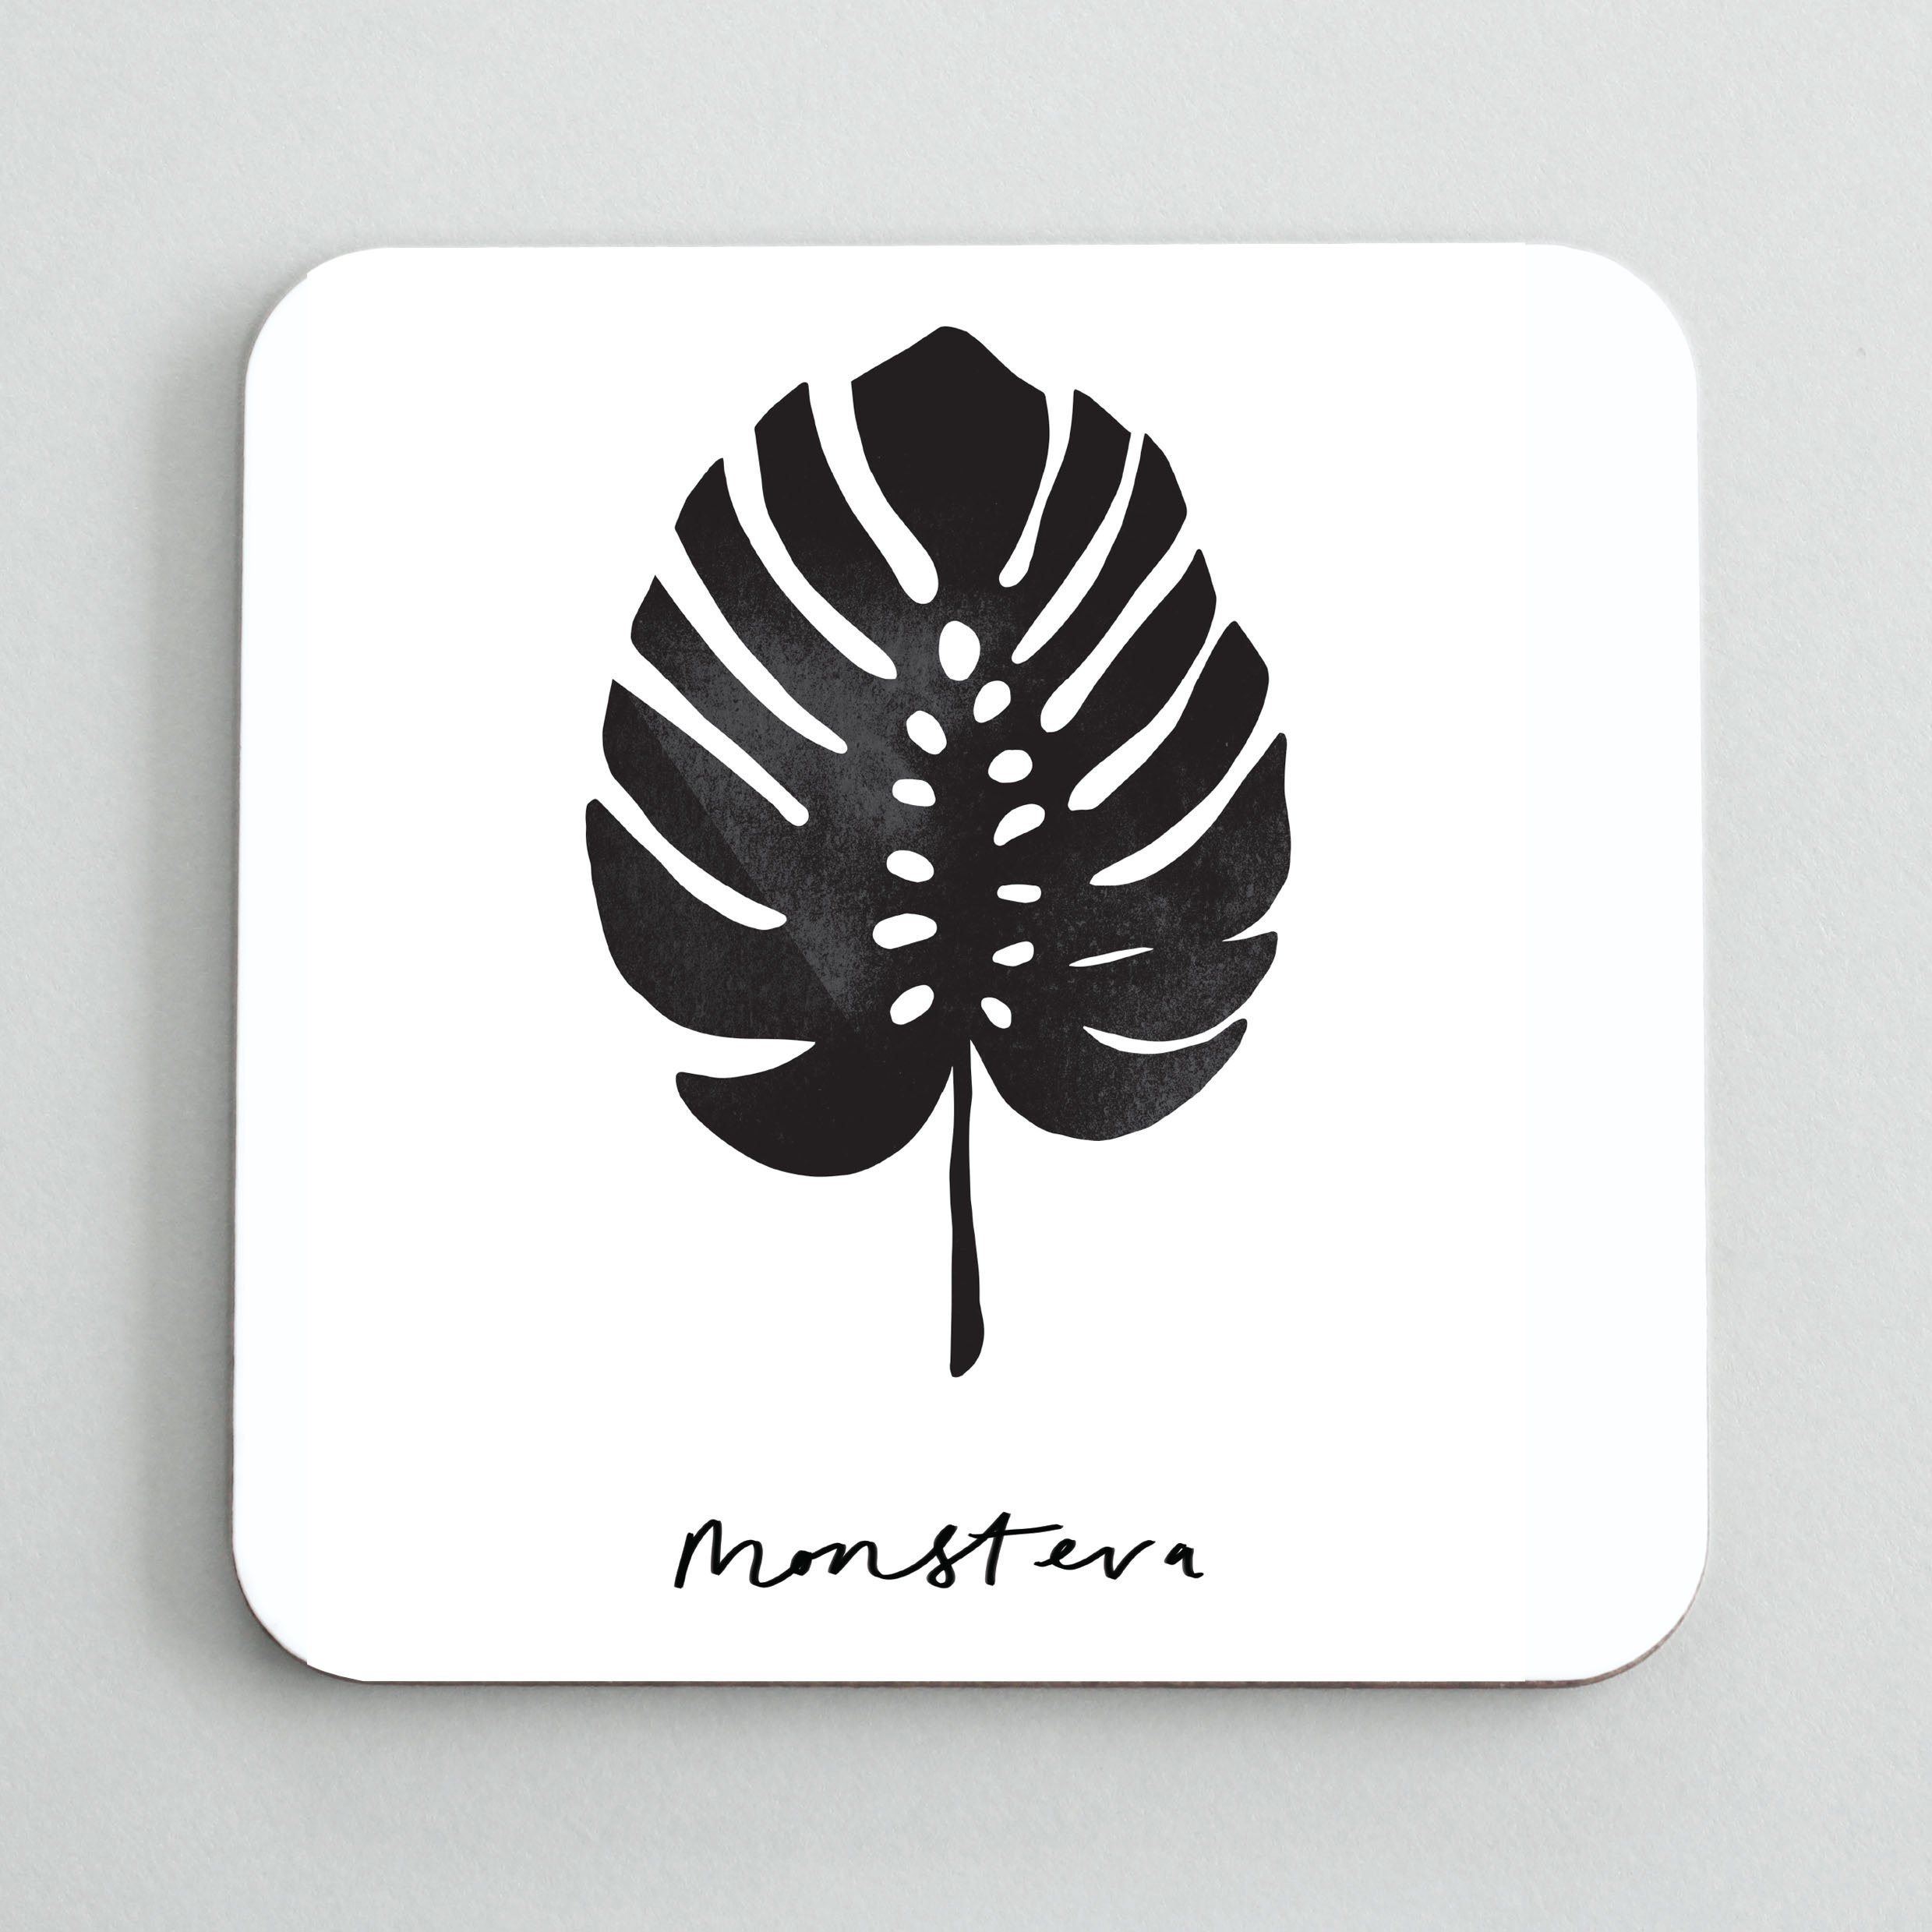 CO81-monstera-leaf-monochrome-coaster.jpg